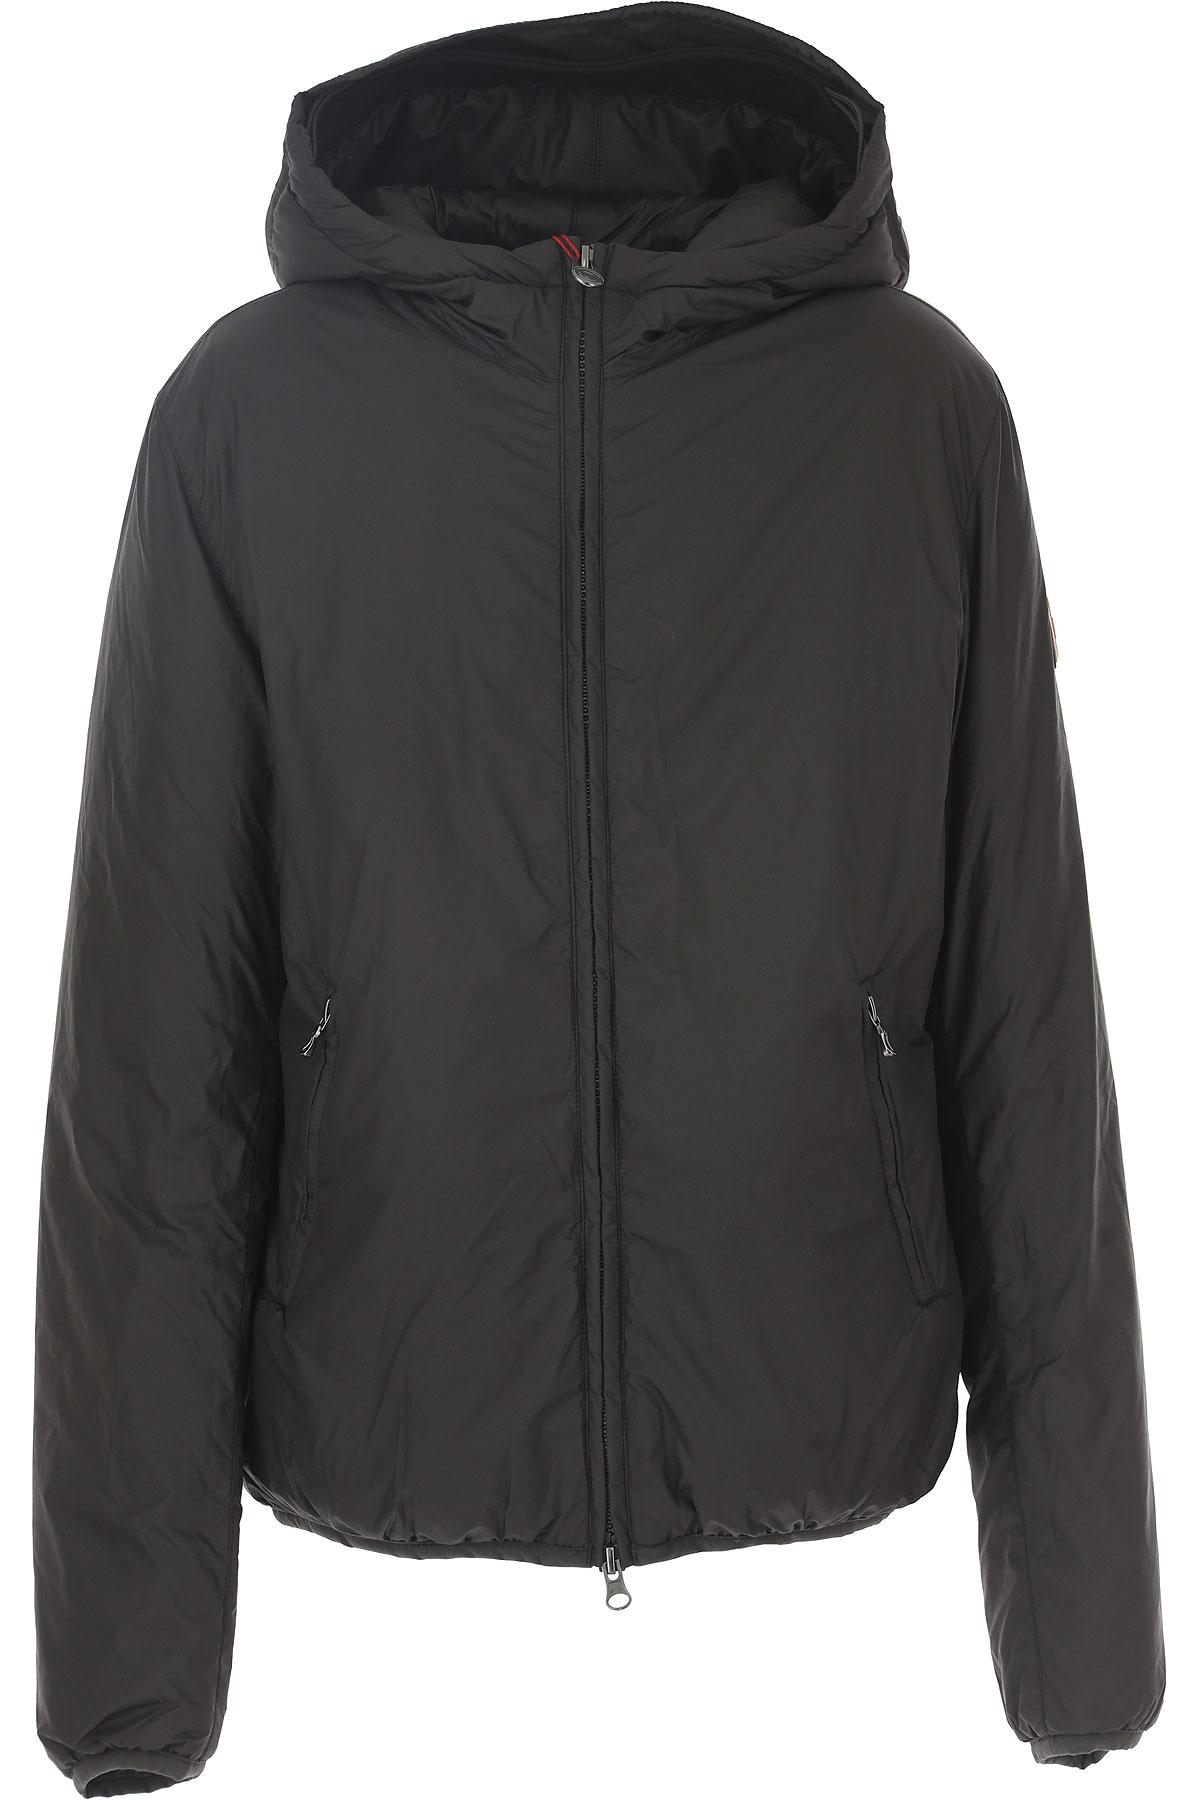 Image of Colmar Boys Down Jacket for Kids, Puffer Ski Jacket On Sale, Black, polyester, 2017, 14Y 16Y